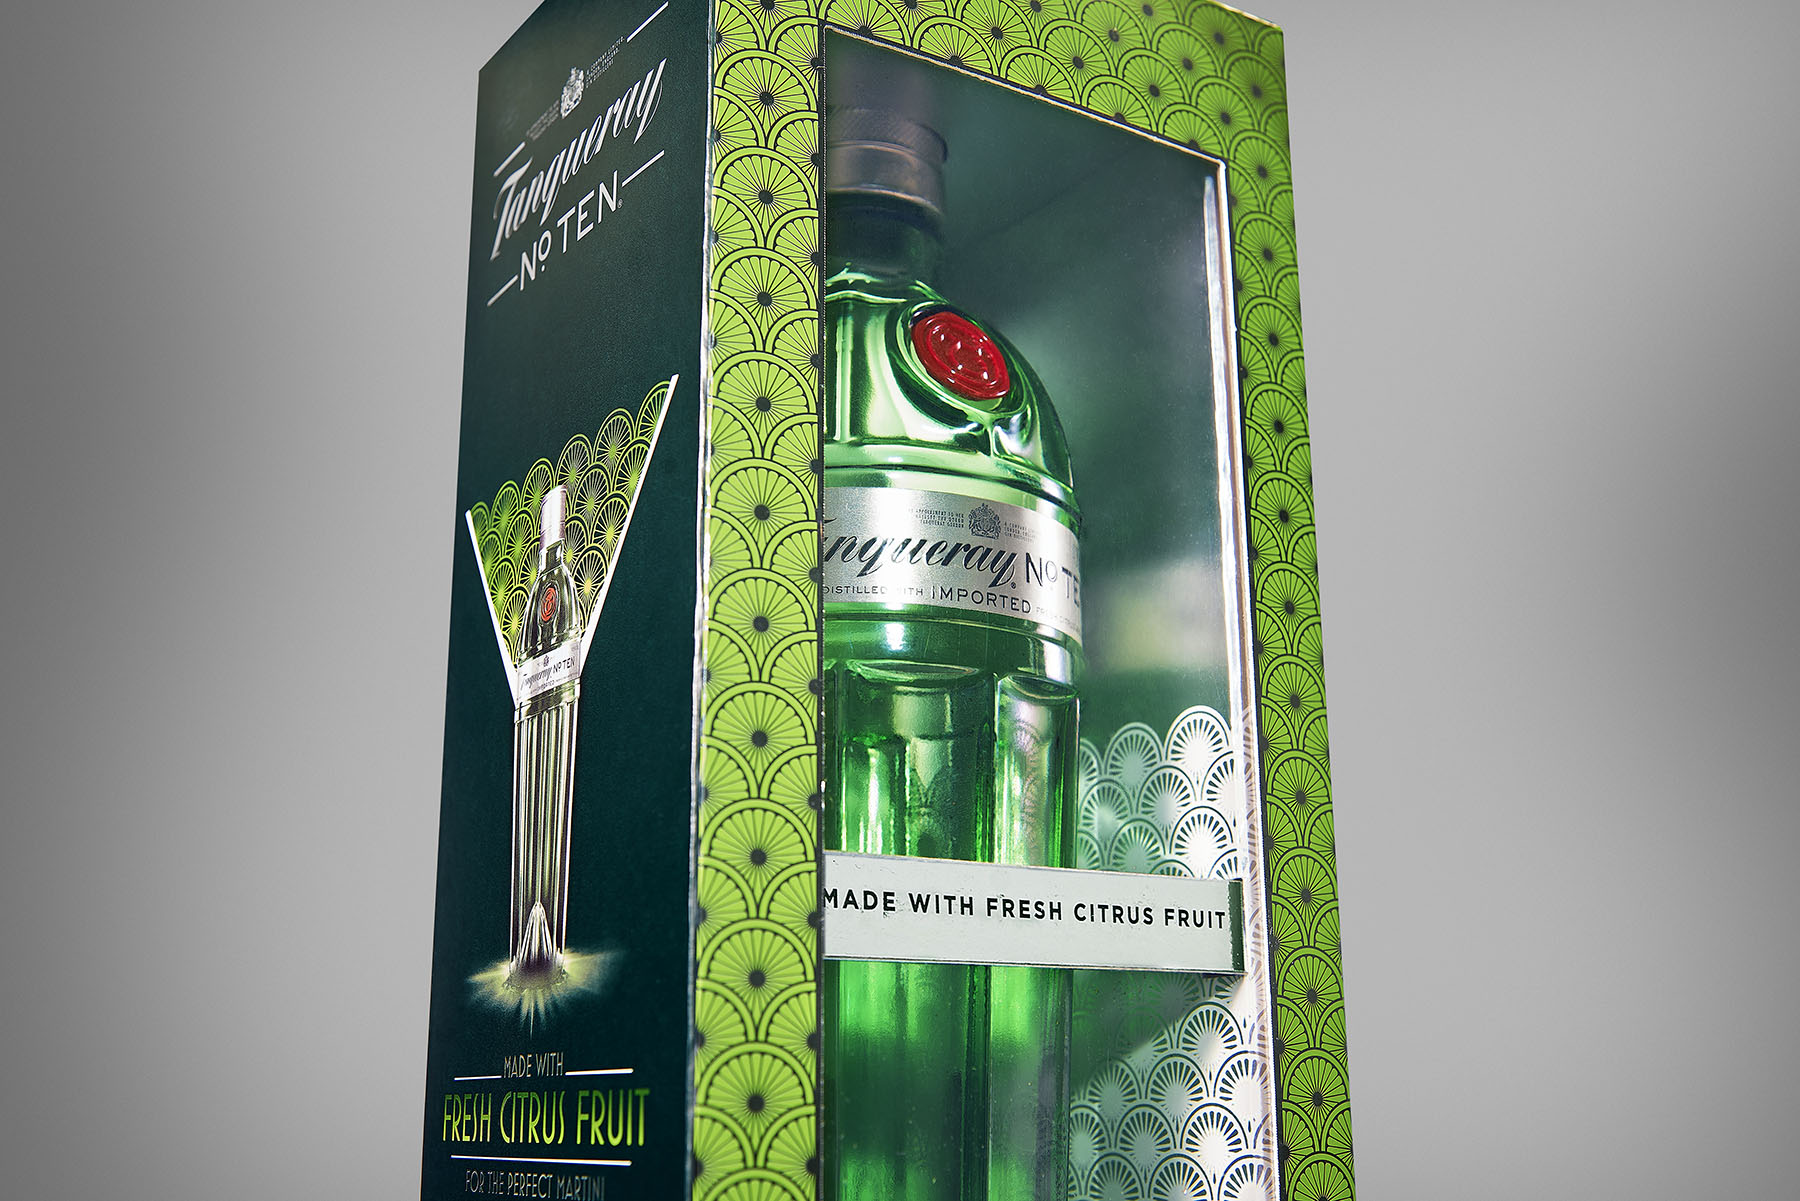 Packaging Tanqueray Nº TEN